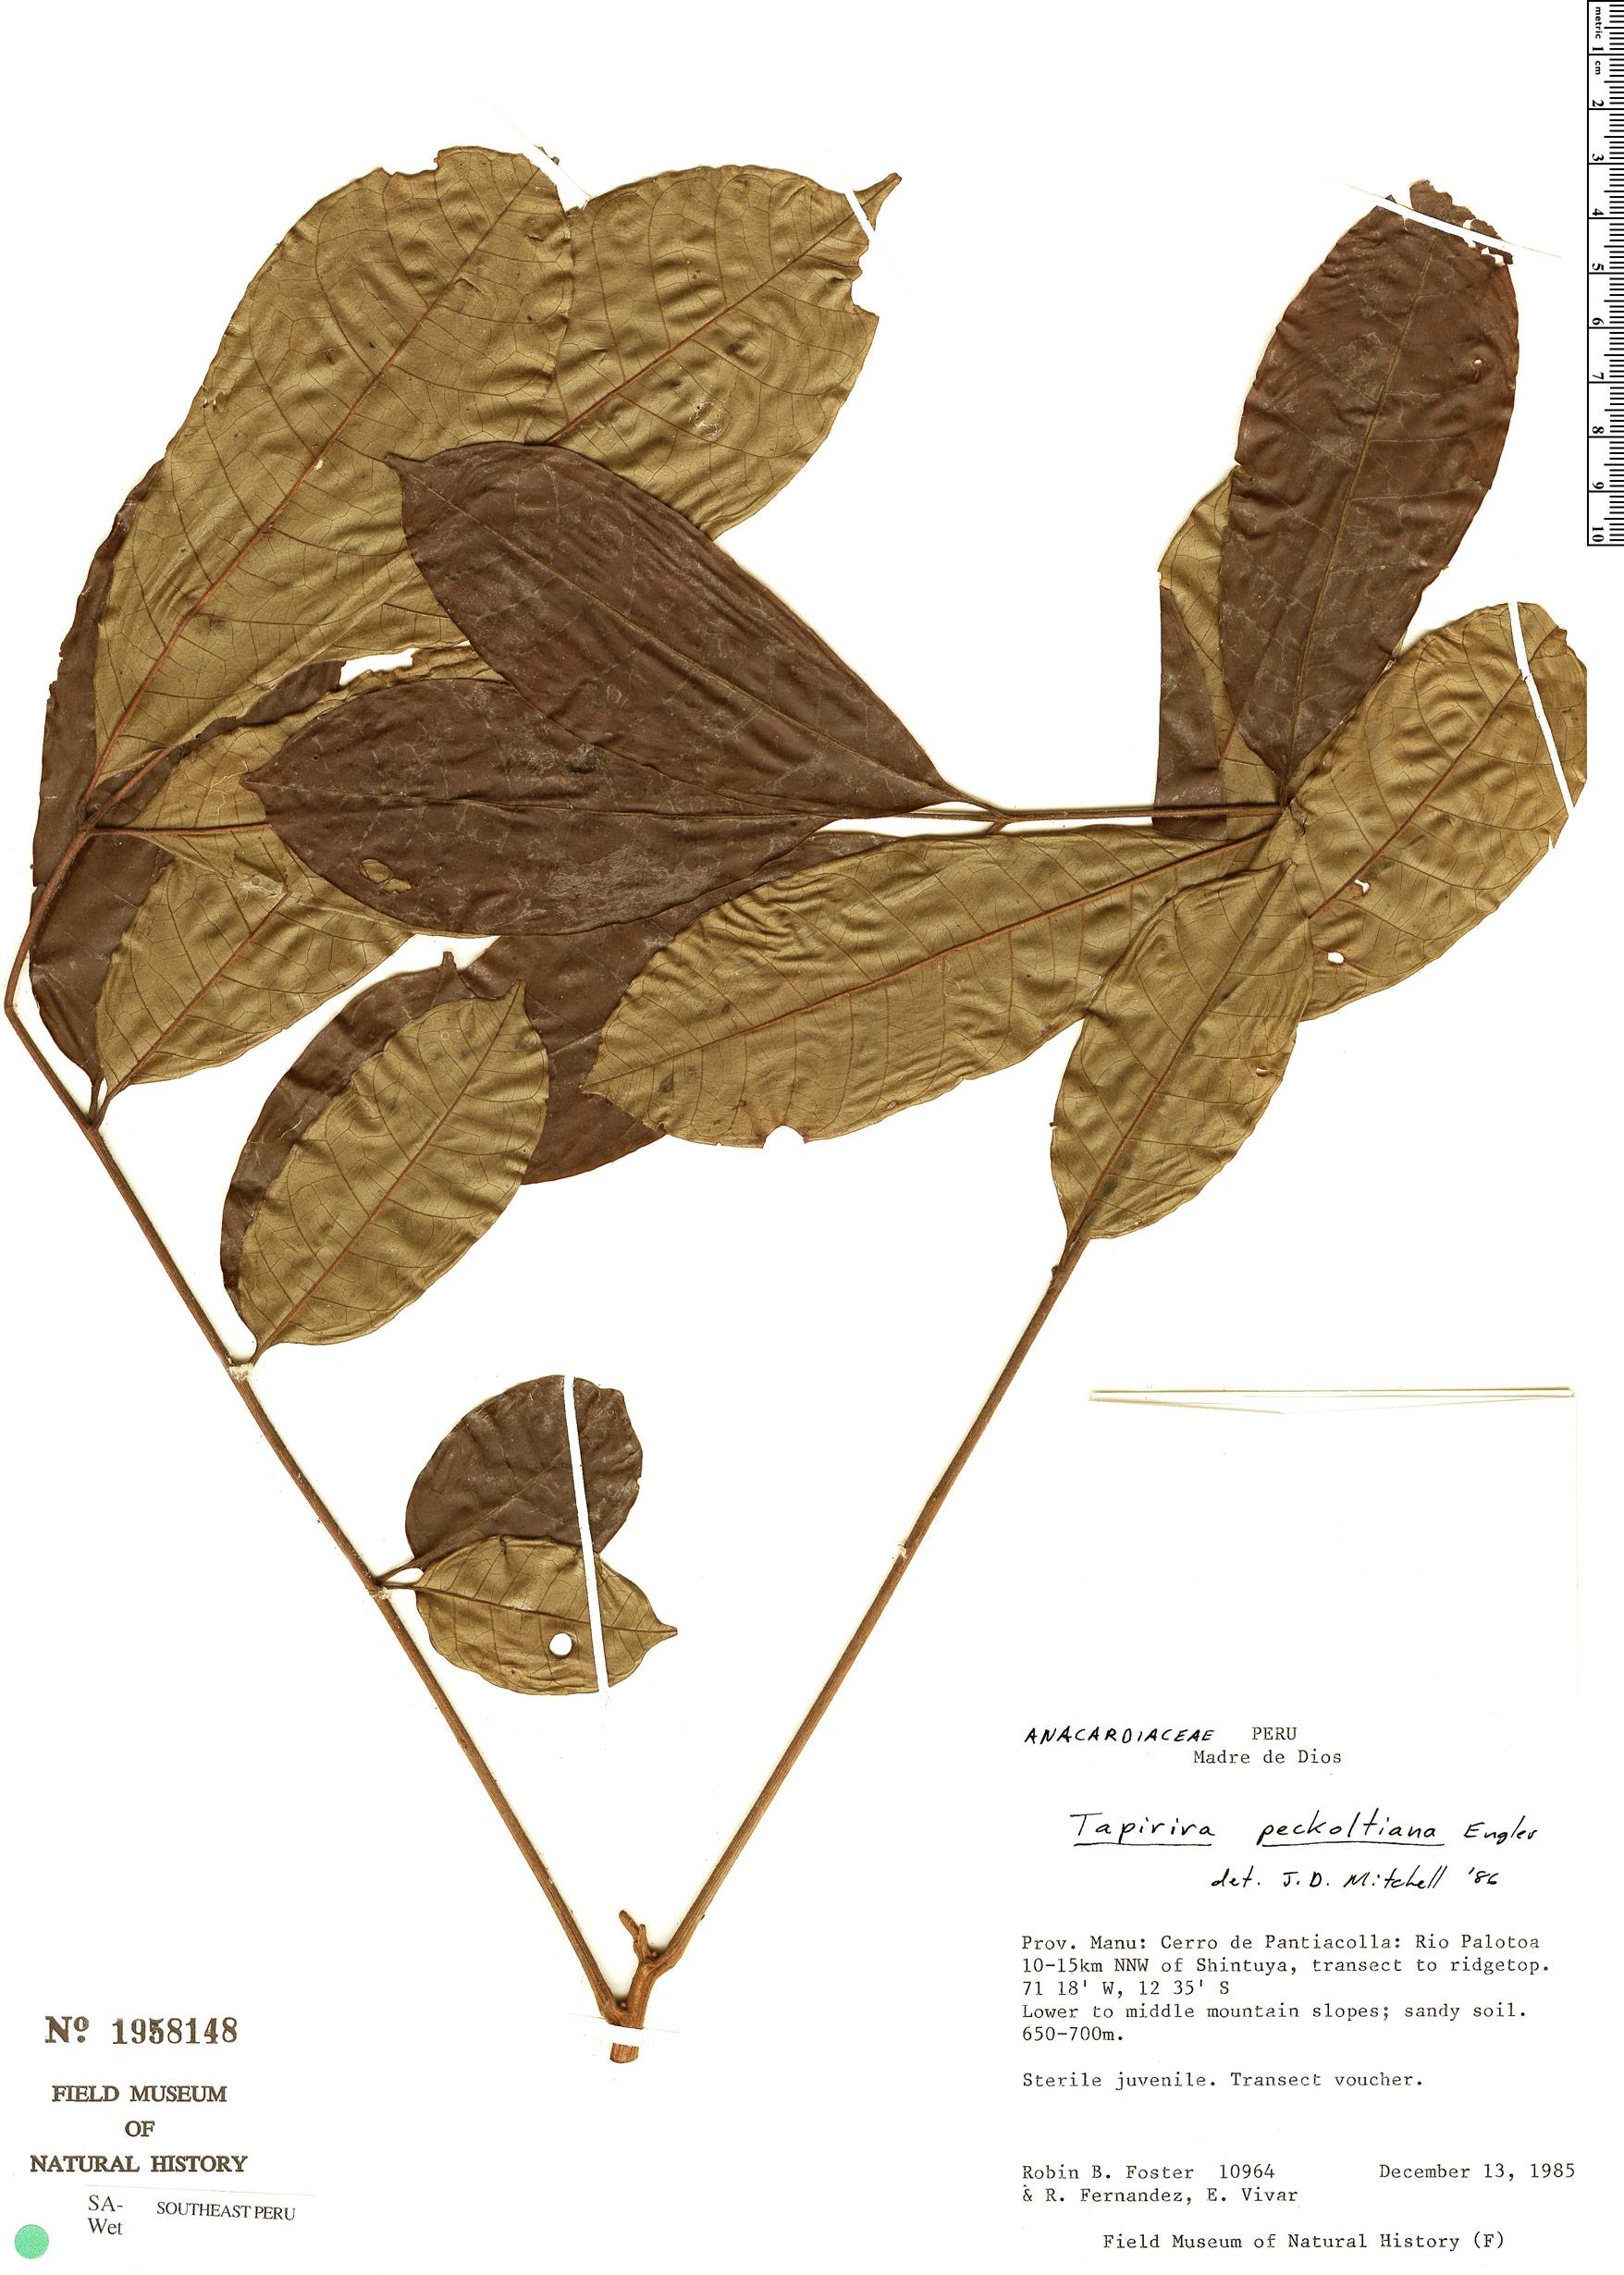 Specimen: Tapirira obtusa